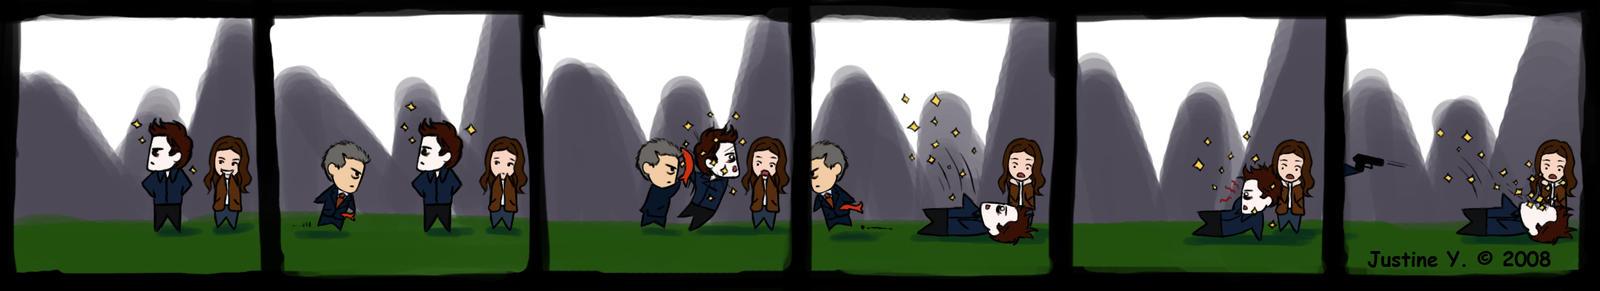 Edward Cullen gets fishslapped by Shirozora